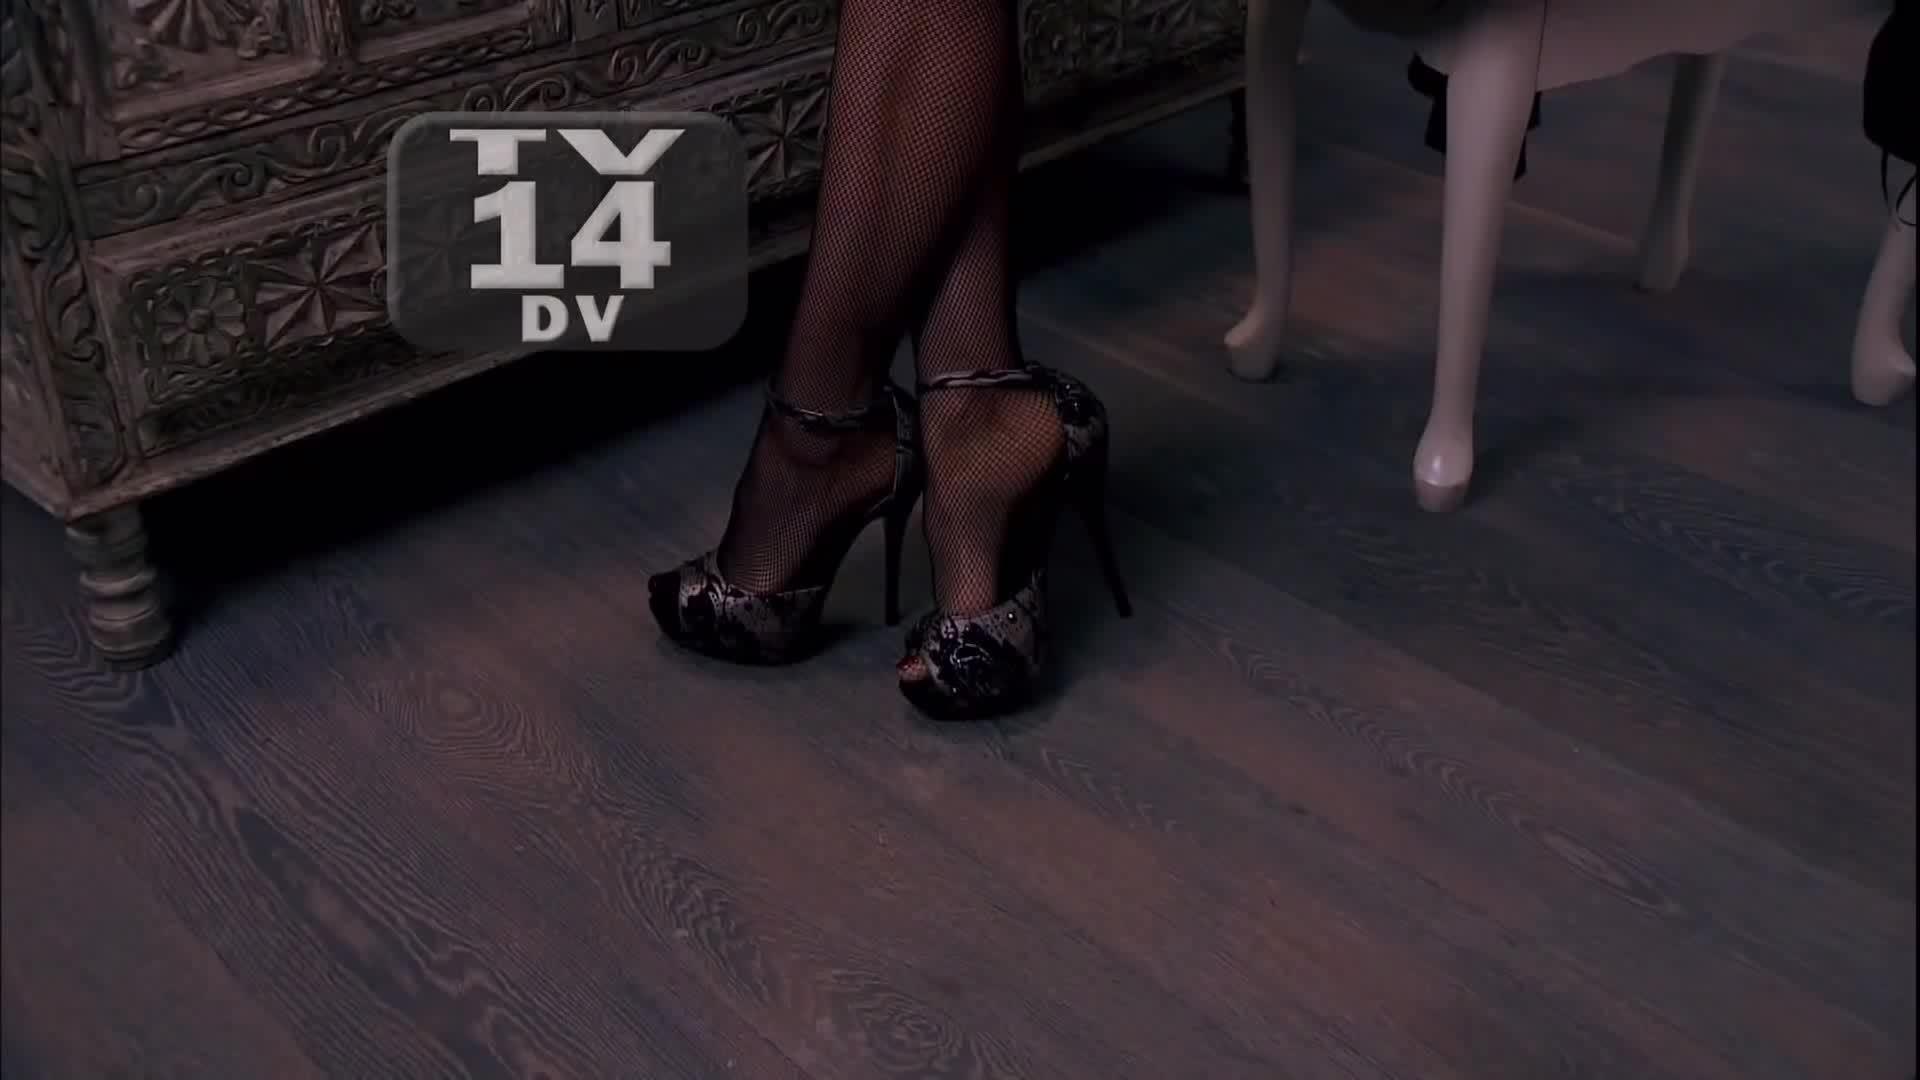 TVCapsHD, gentlemanbonersgifs, newsbabes, Aracely Arambula - La Patrona 2013/03/07 HD; lingerie GIFs